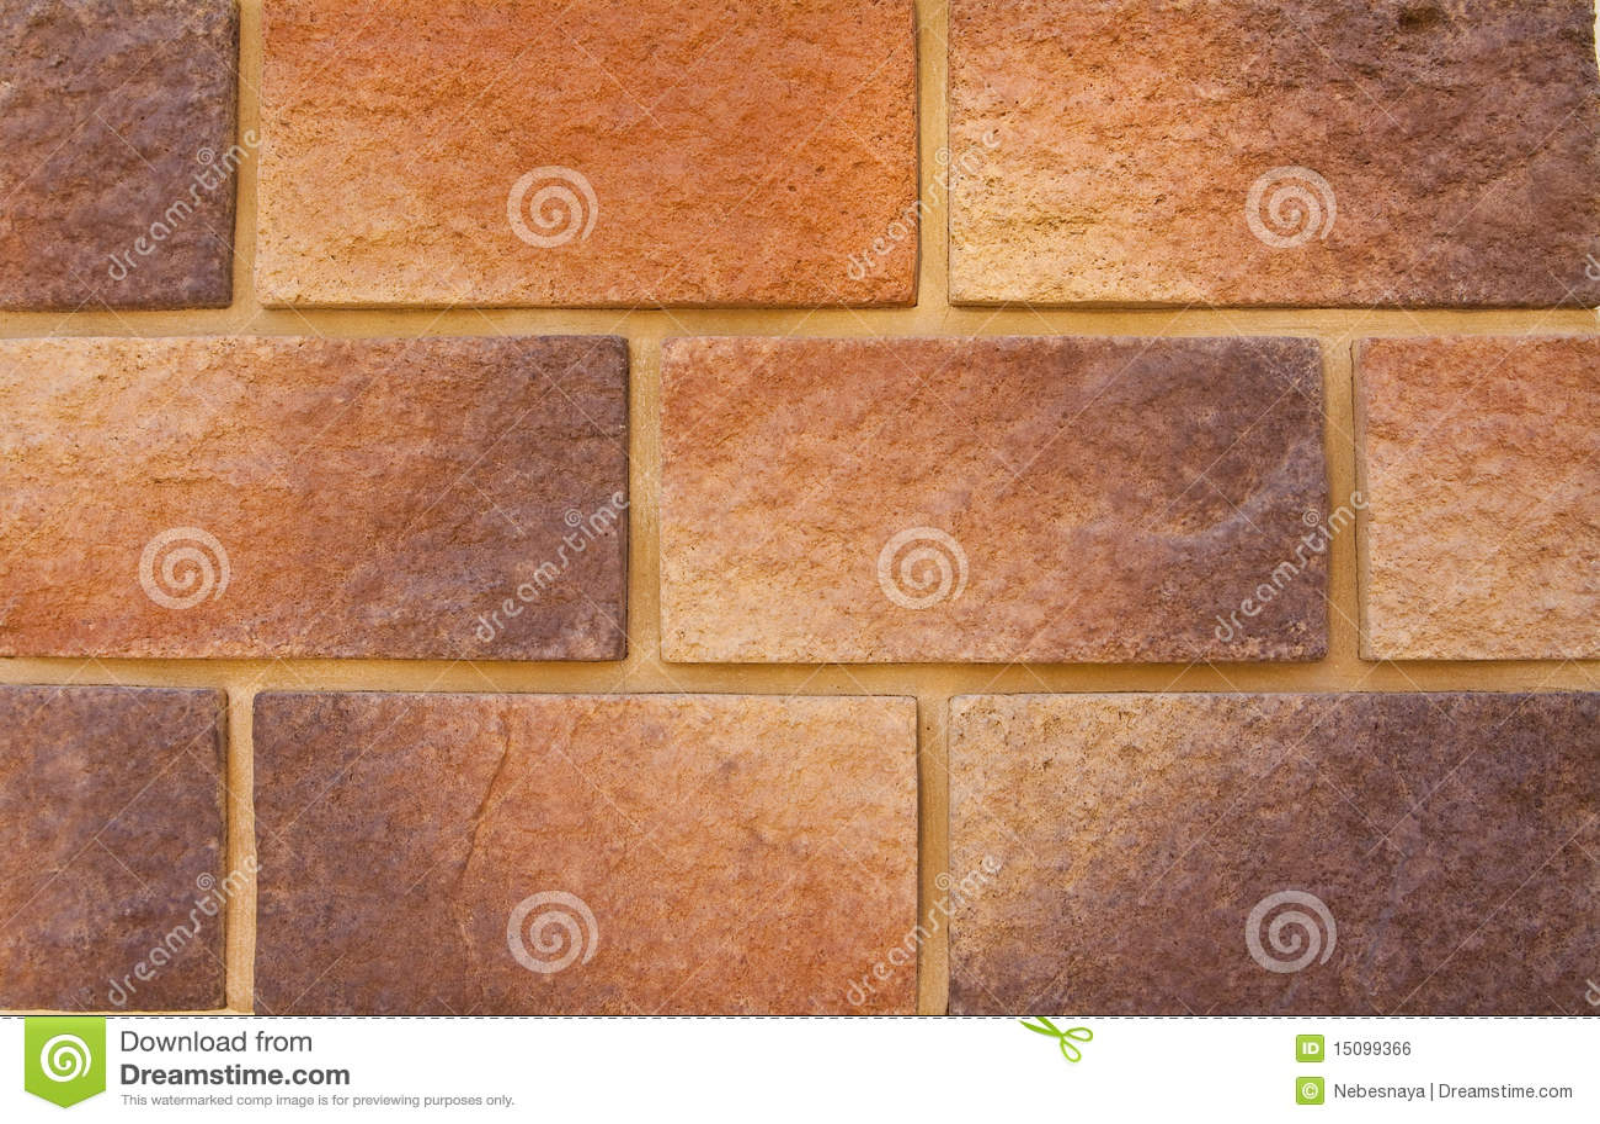 Decorative Masonry Walls : Colorful decorative brick wall background royalty free